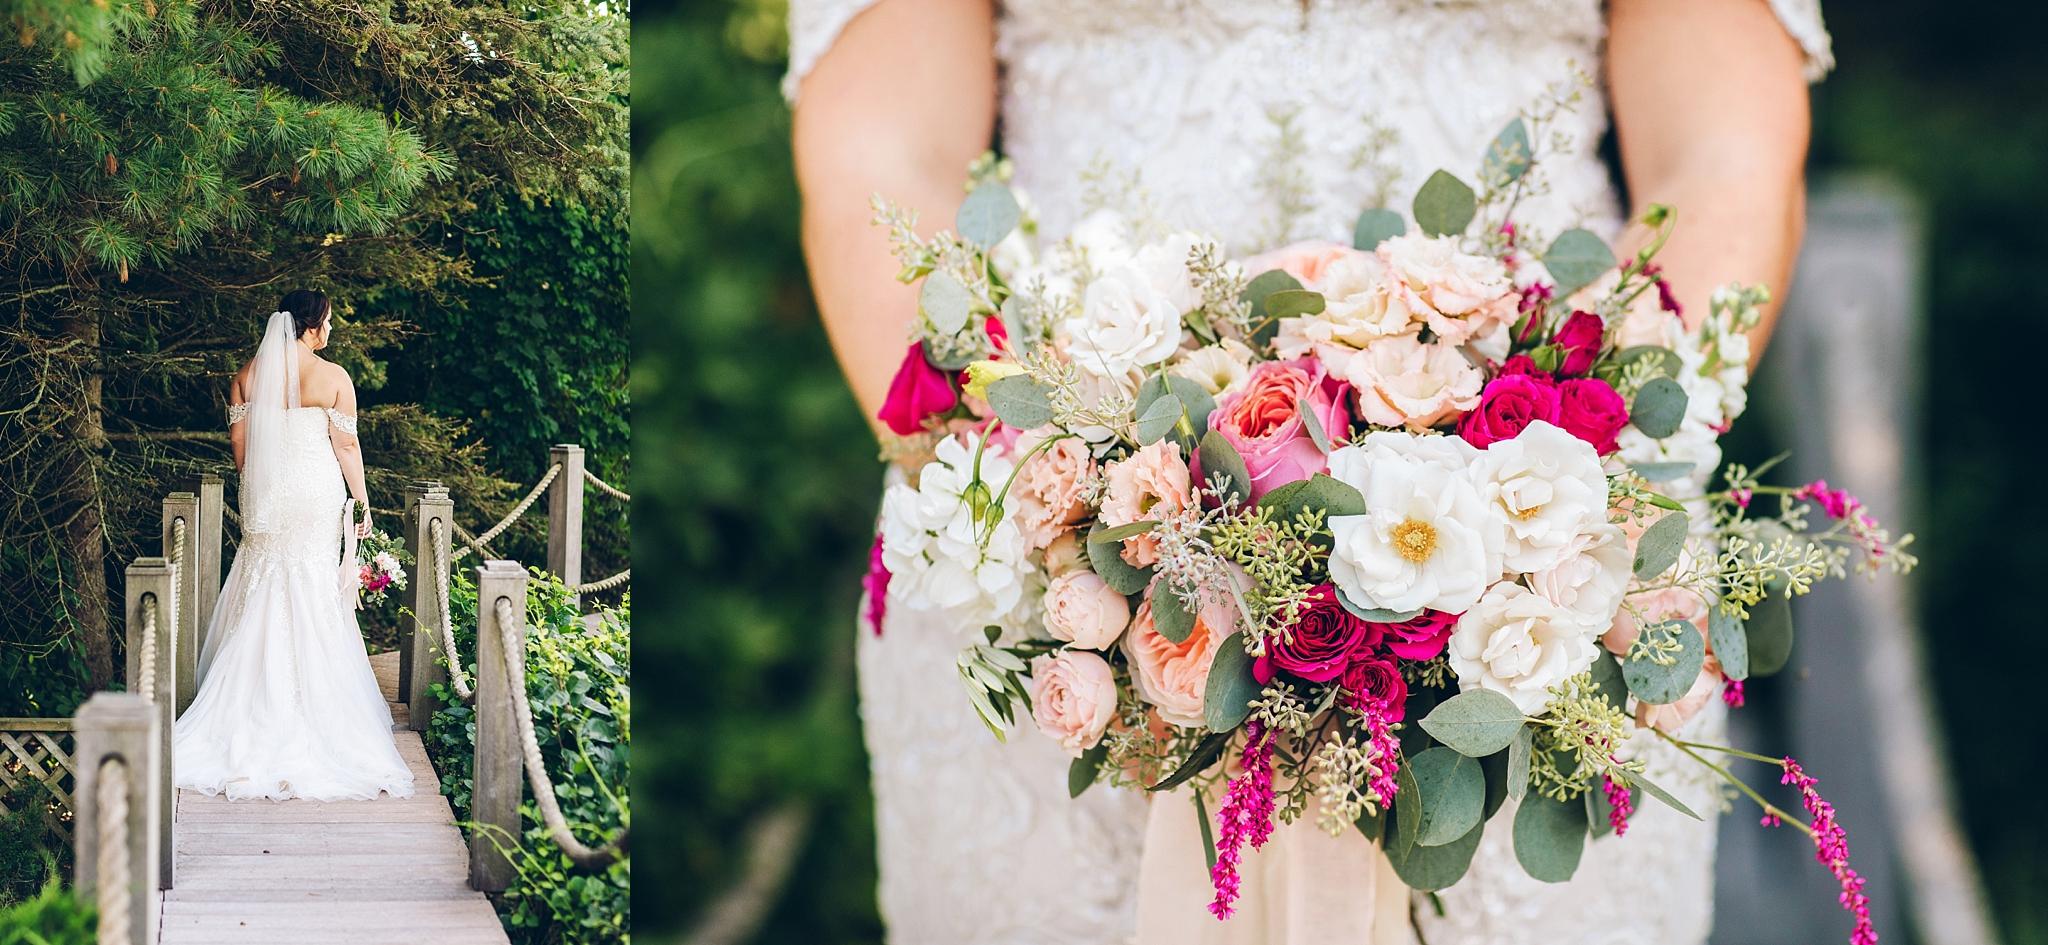 baker-lofts-holland-michigan-wedding-photographer_0312.jpg